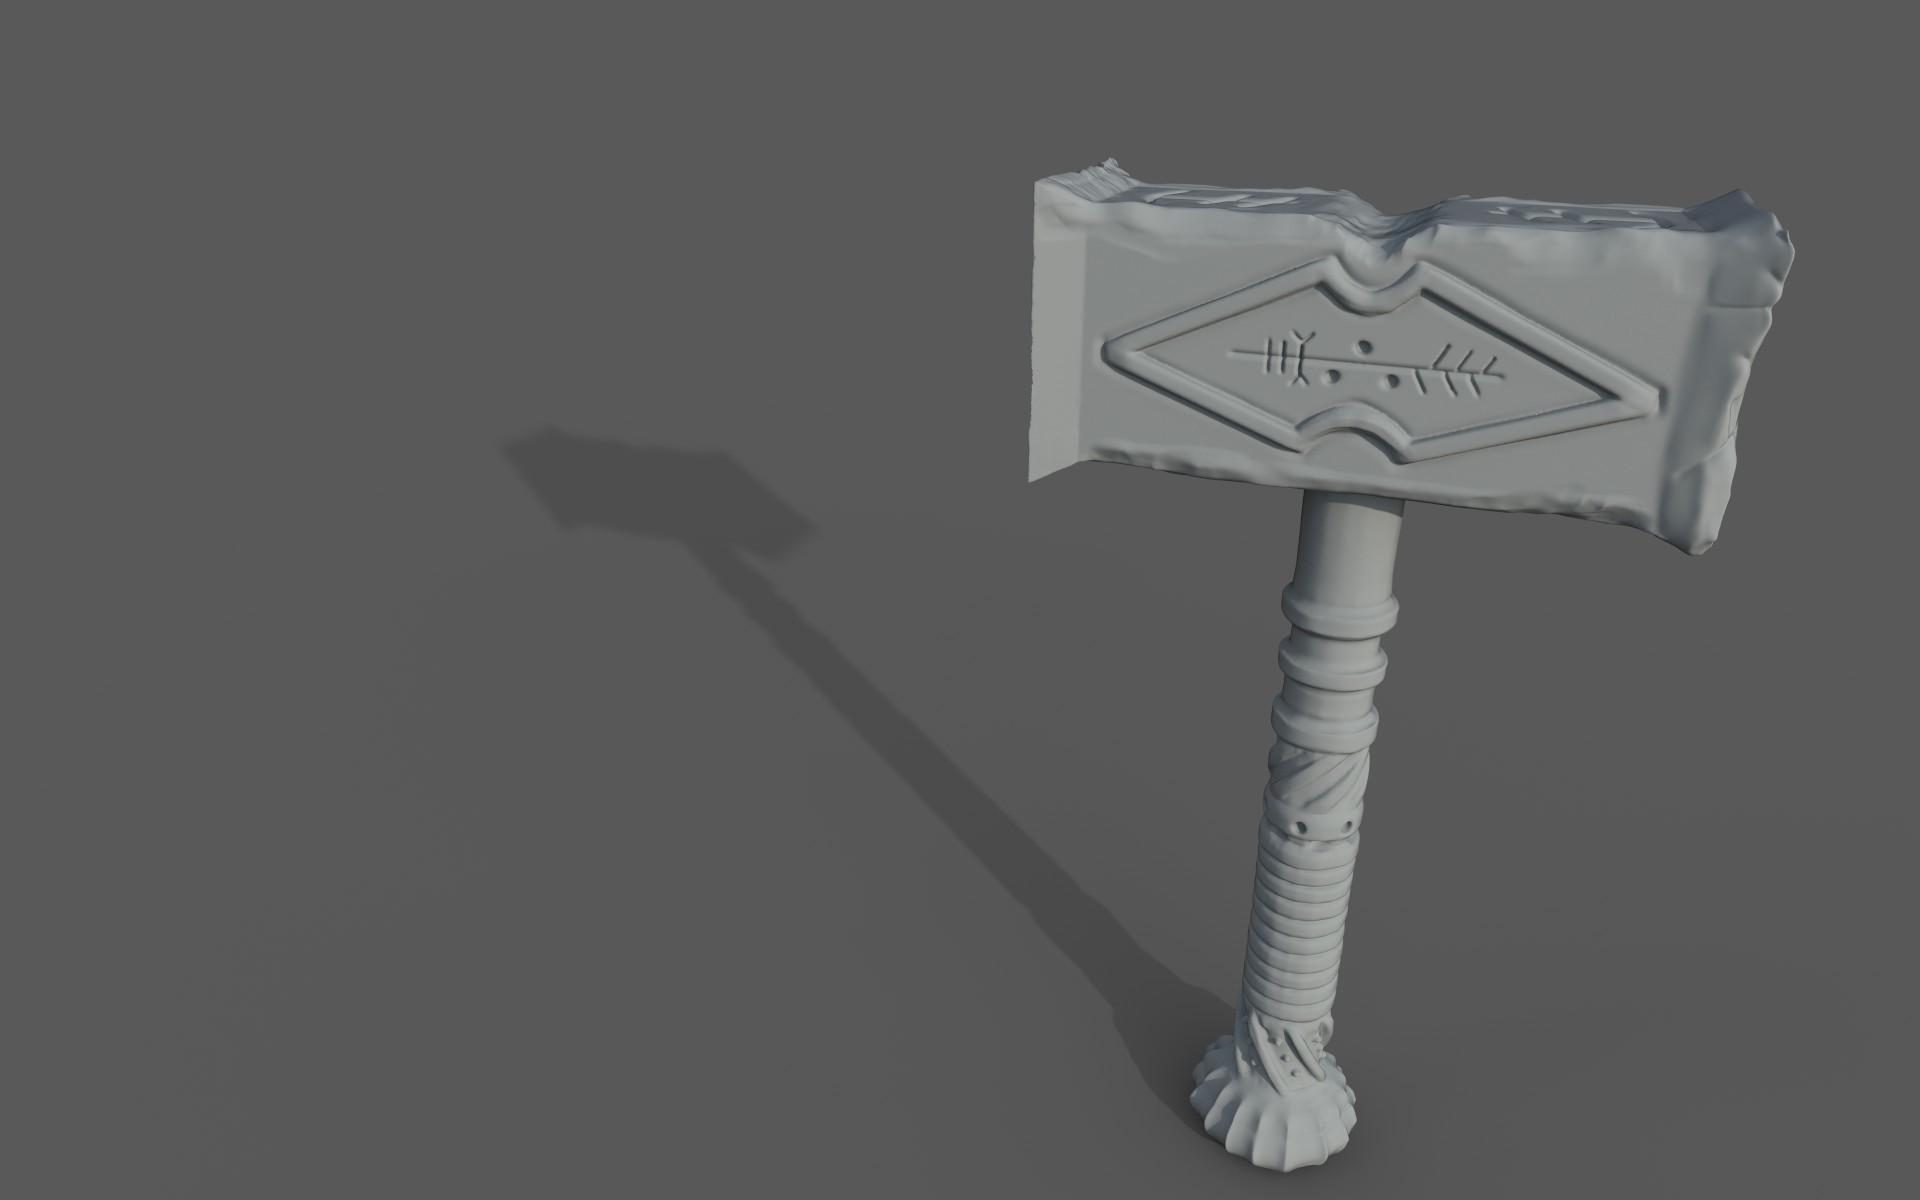 Matej chalachan hammer sculpt